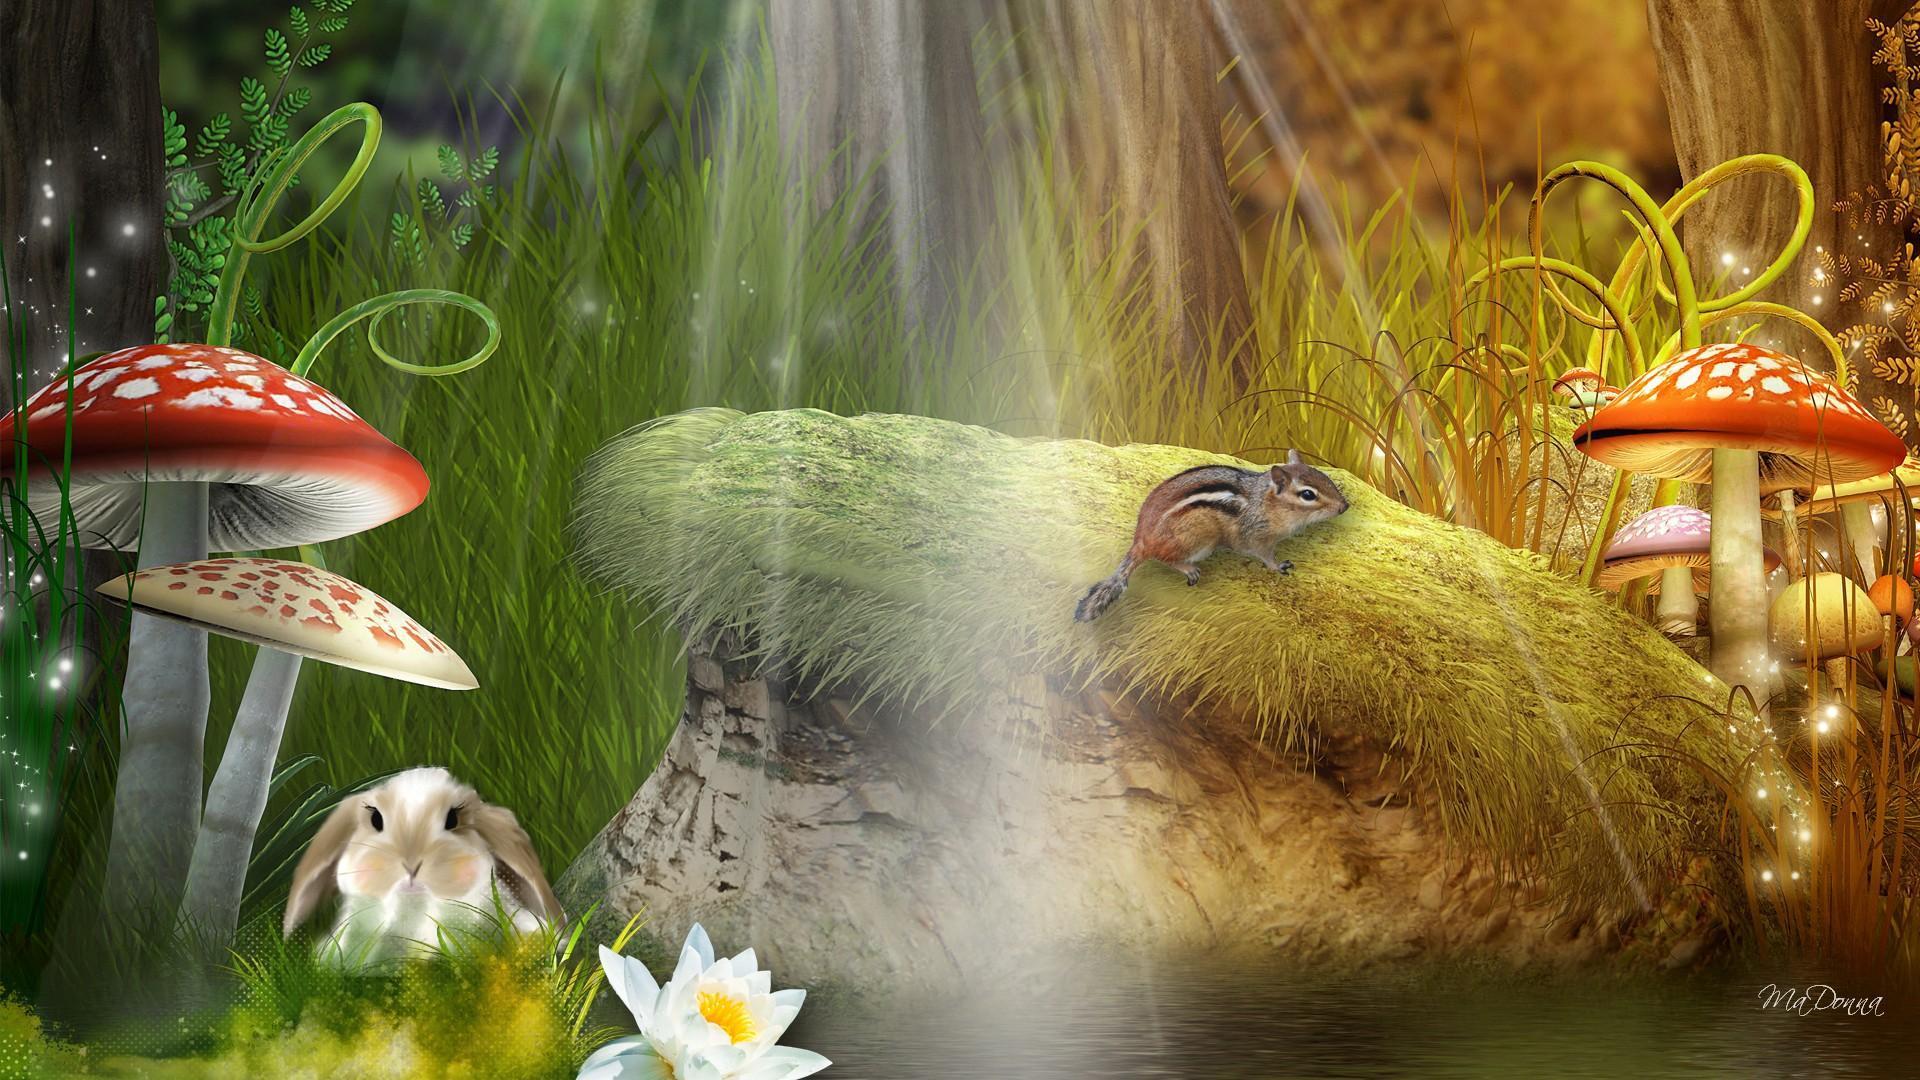 Fall Chipmunk Hd Wallpapers Summer To Fall In Fantasy Forest Hd Desktop Wallpaper